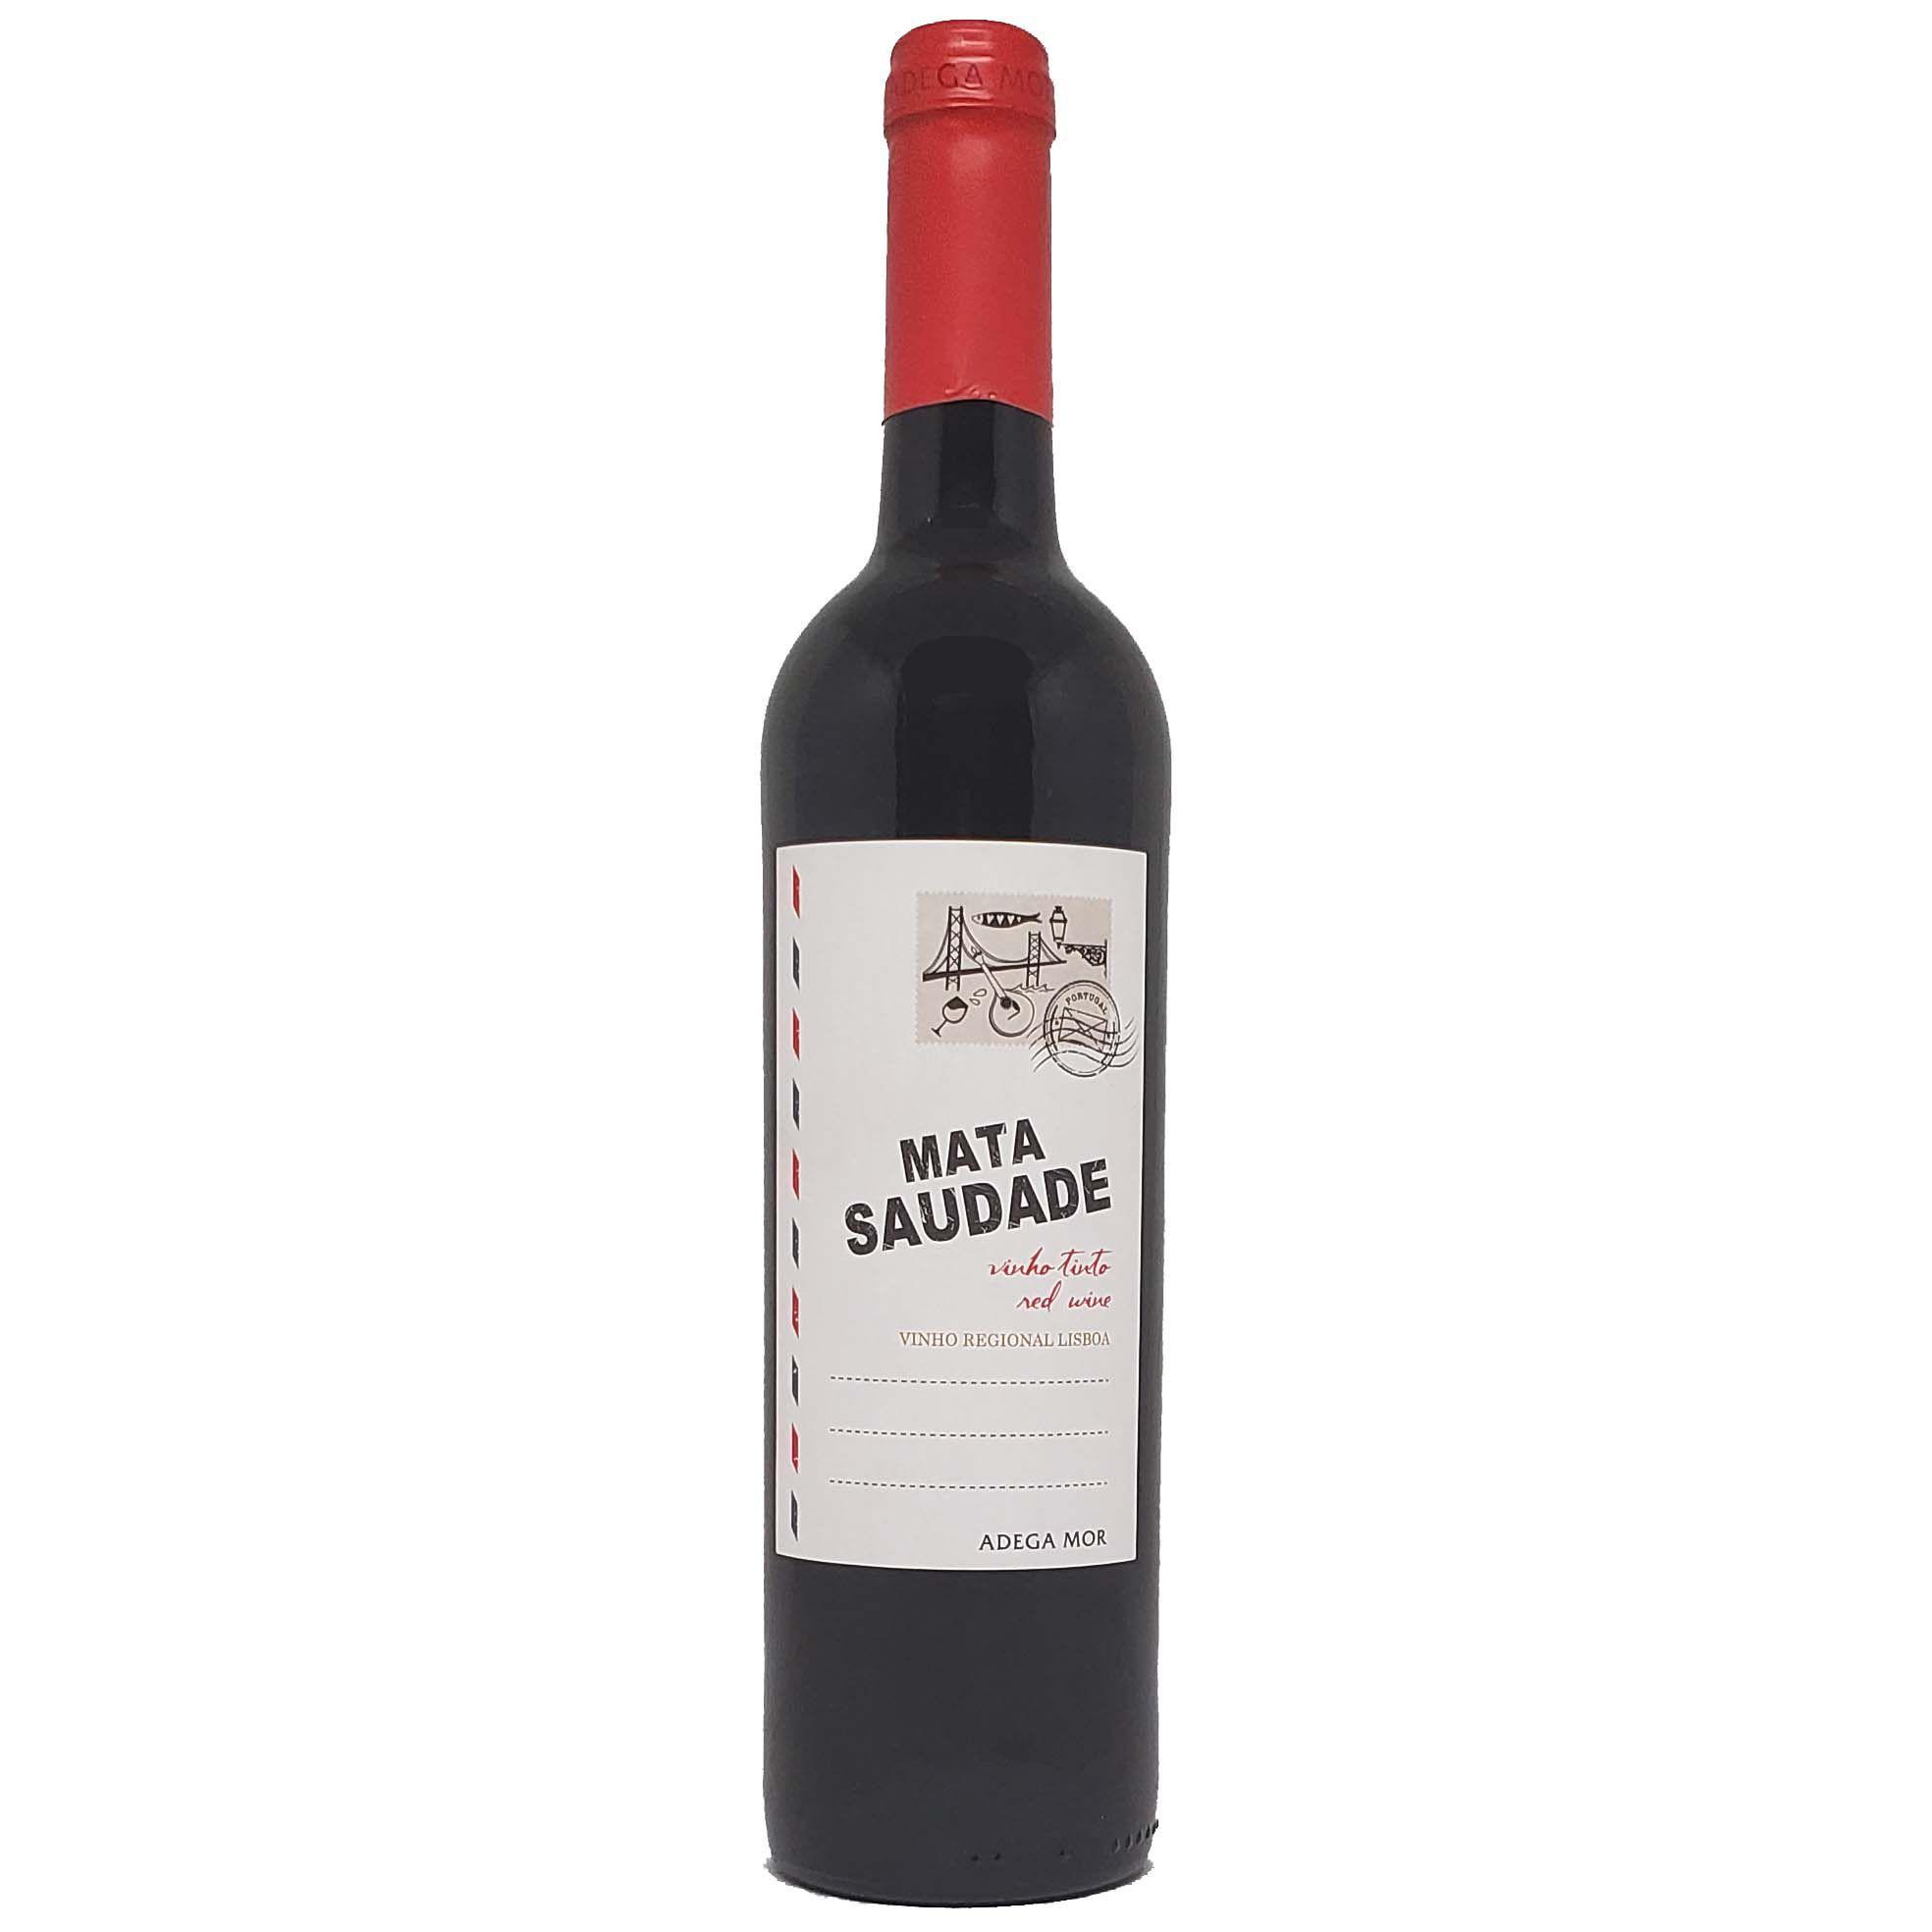 Vinho Tinto Mata Saudade Adega Mor - 750ml -